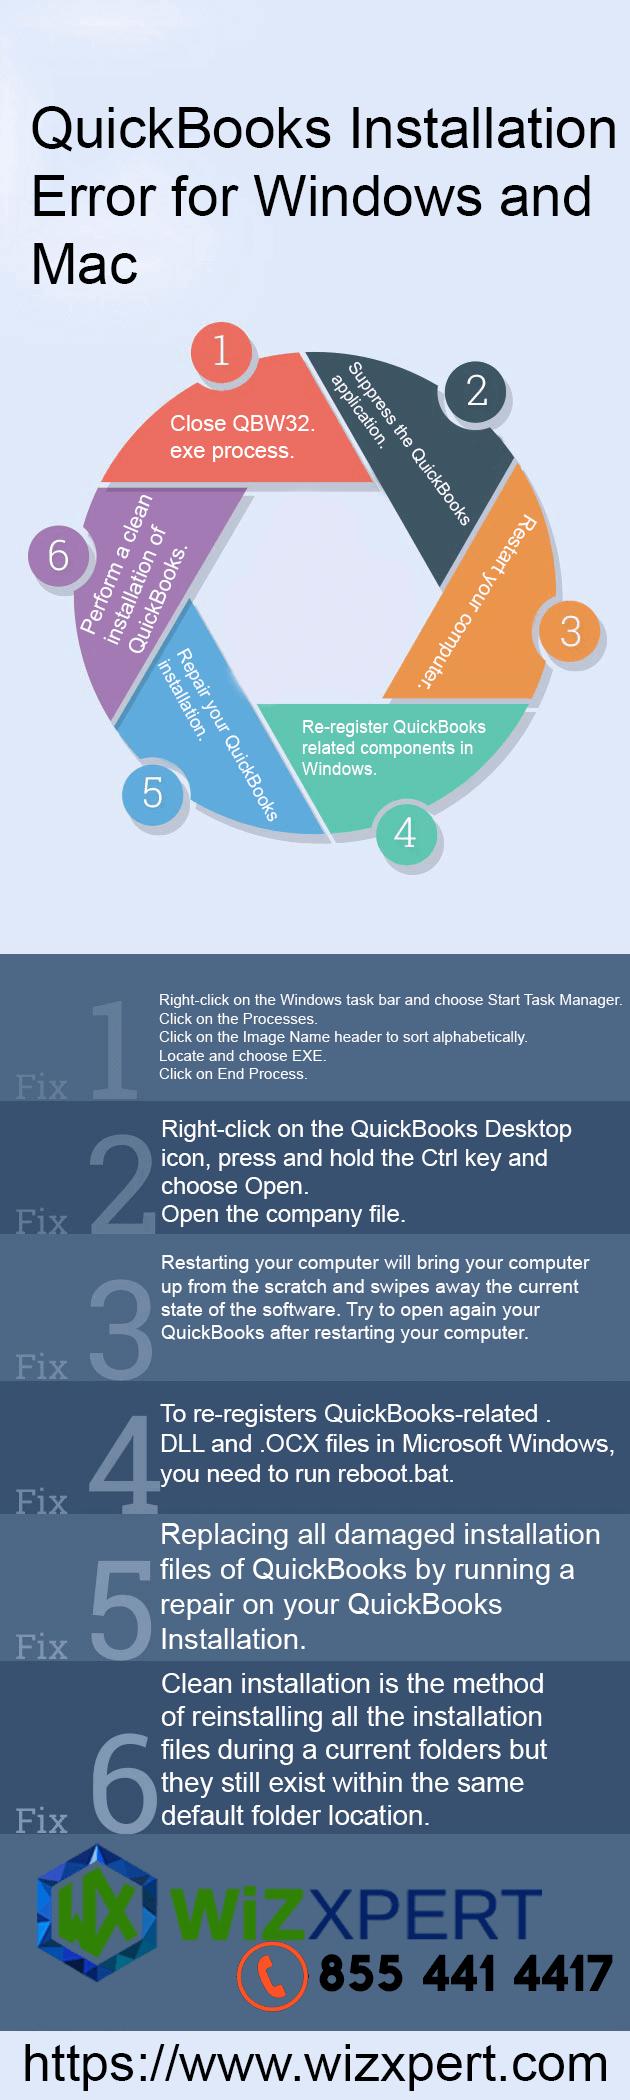 QuickBooks Installation Error for Windows & Mac Infographic